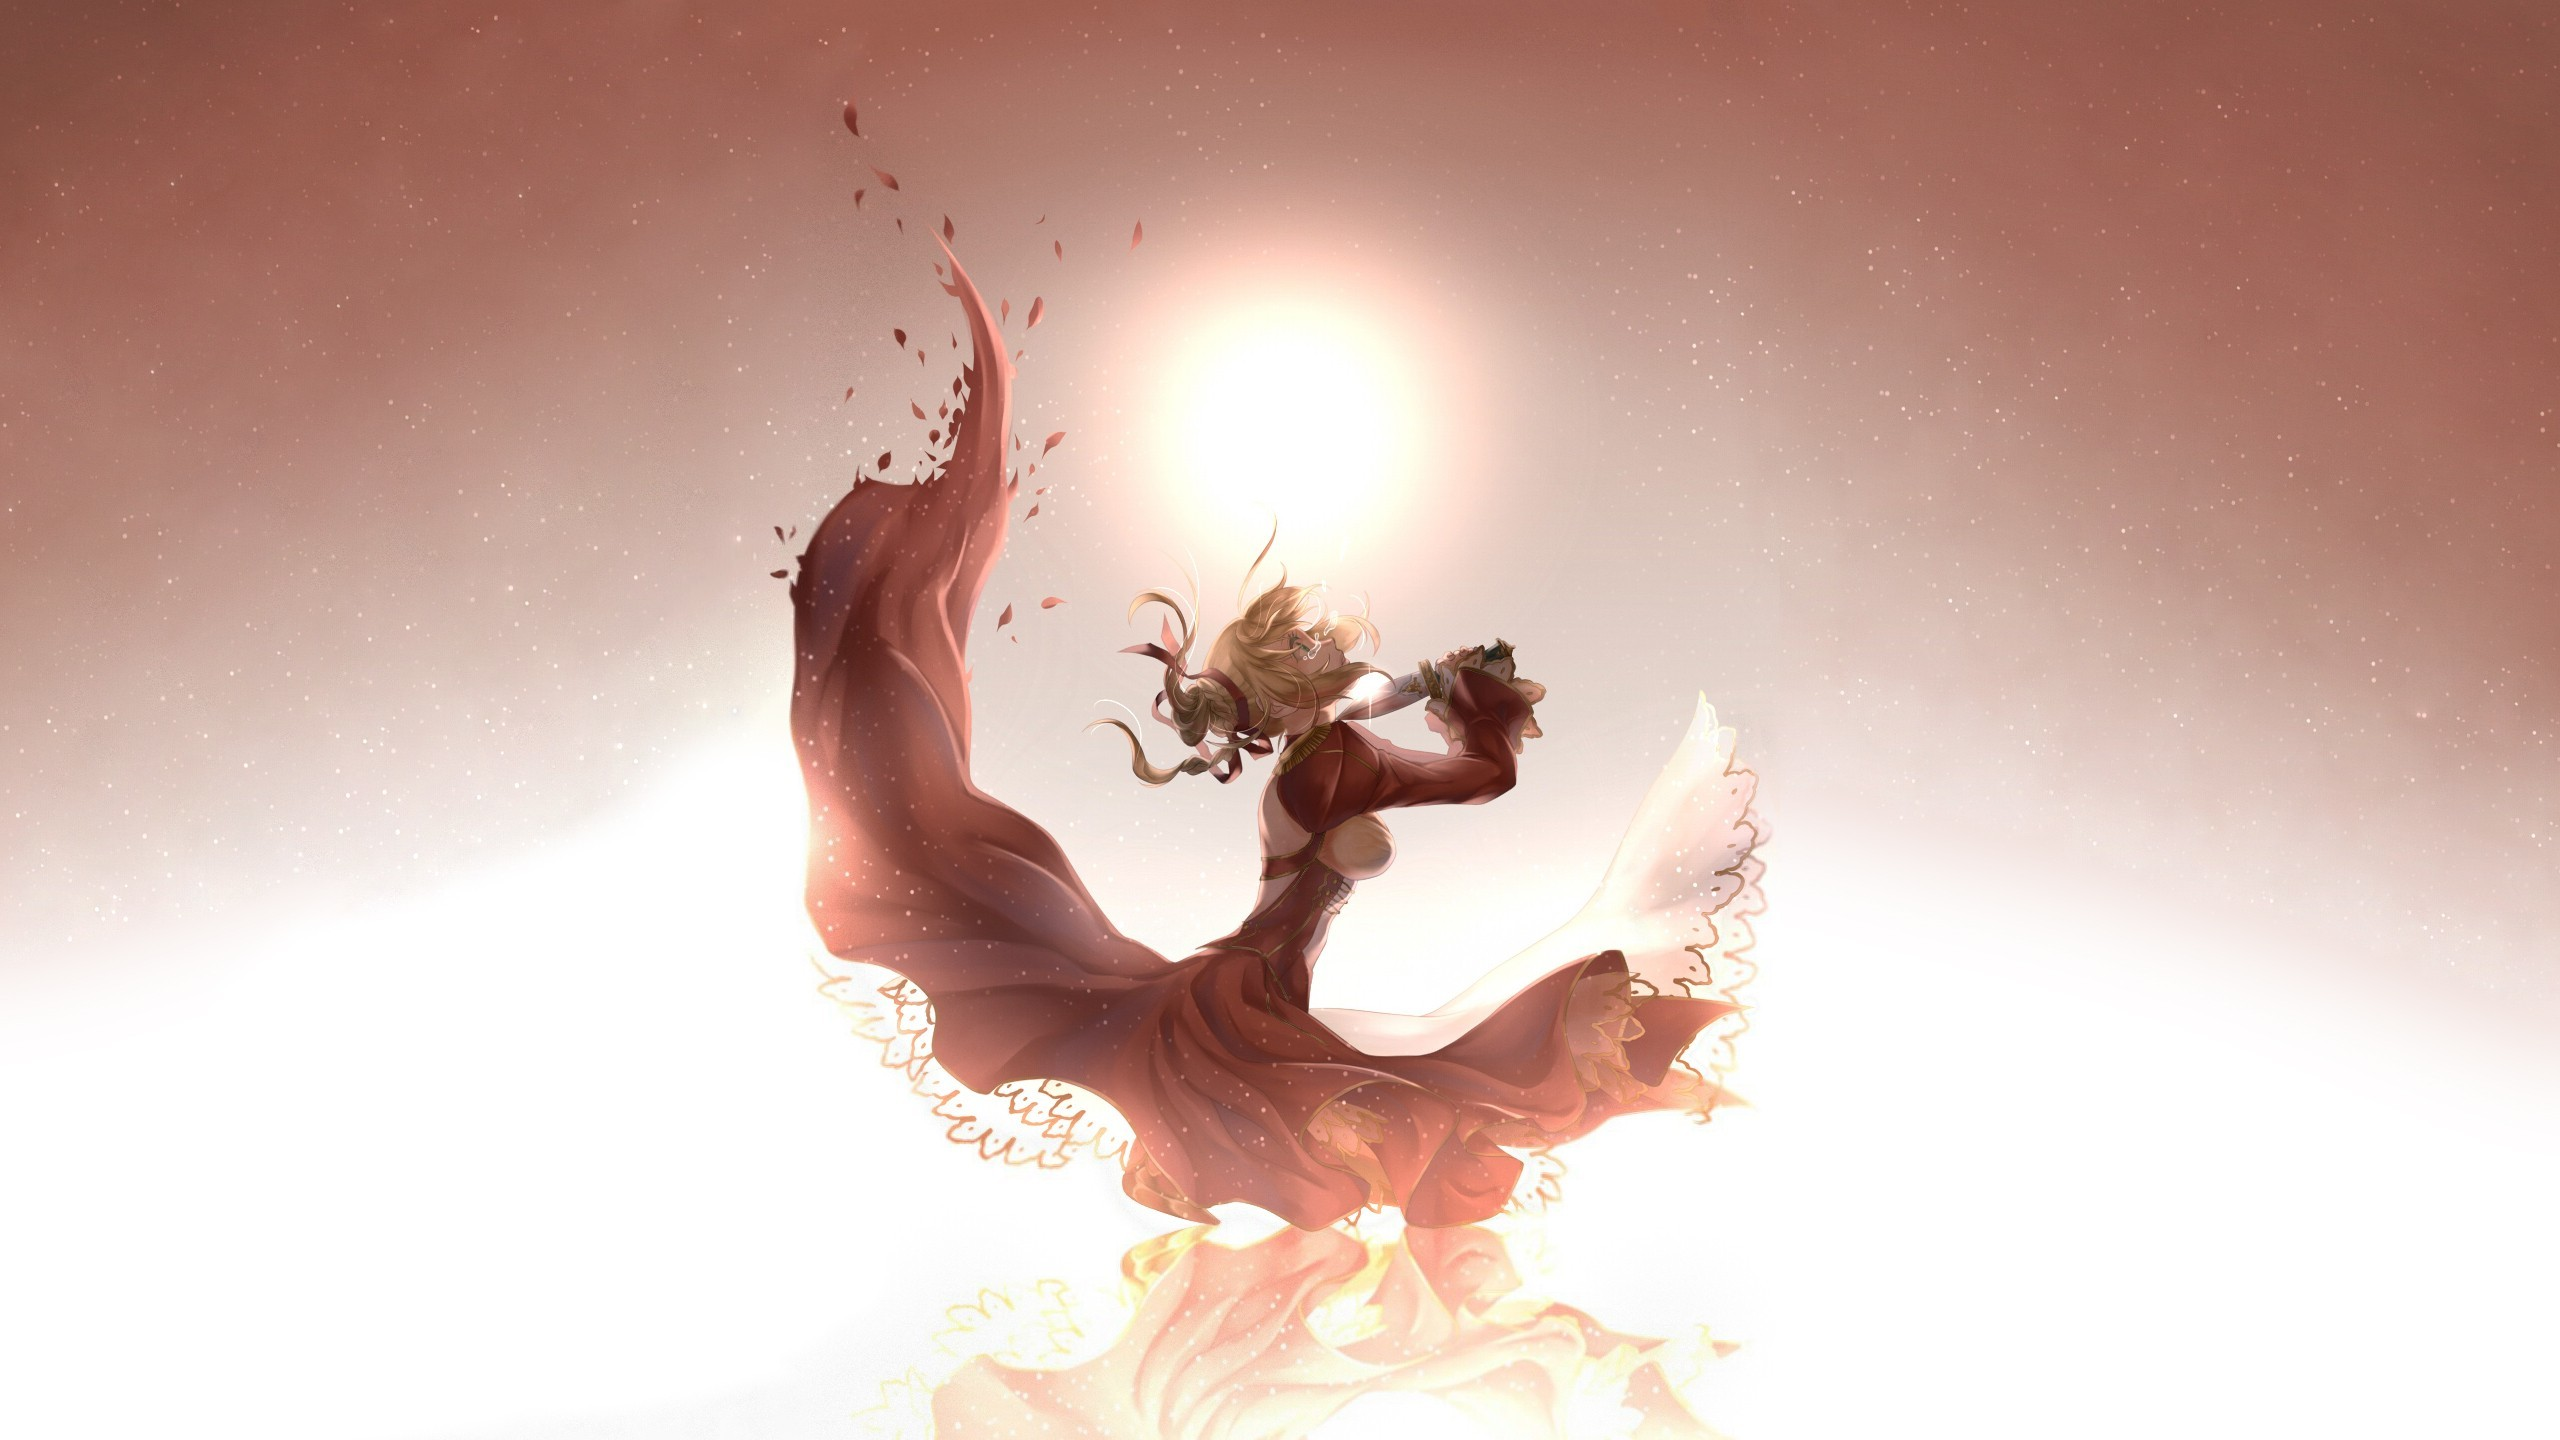 Anime Knife Cry Sad Dress Sunlight mood dark wallpaper | | 91286  | WallpaperUP